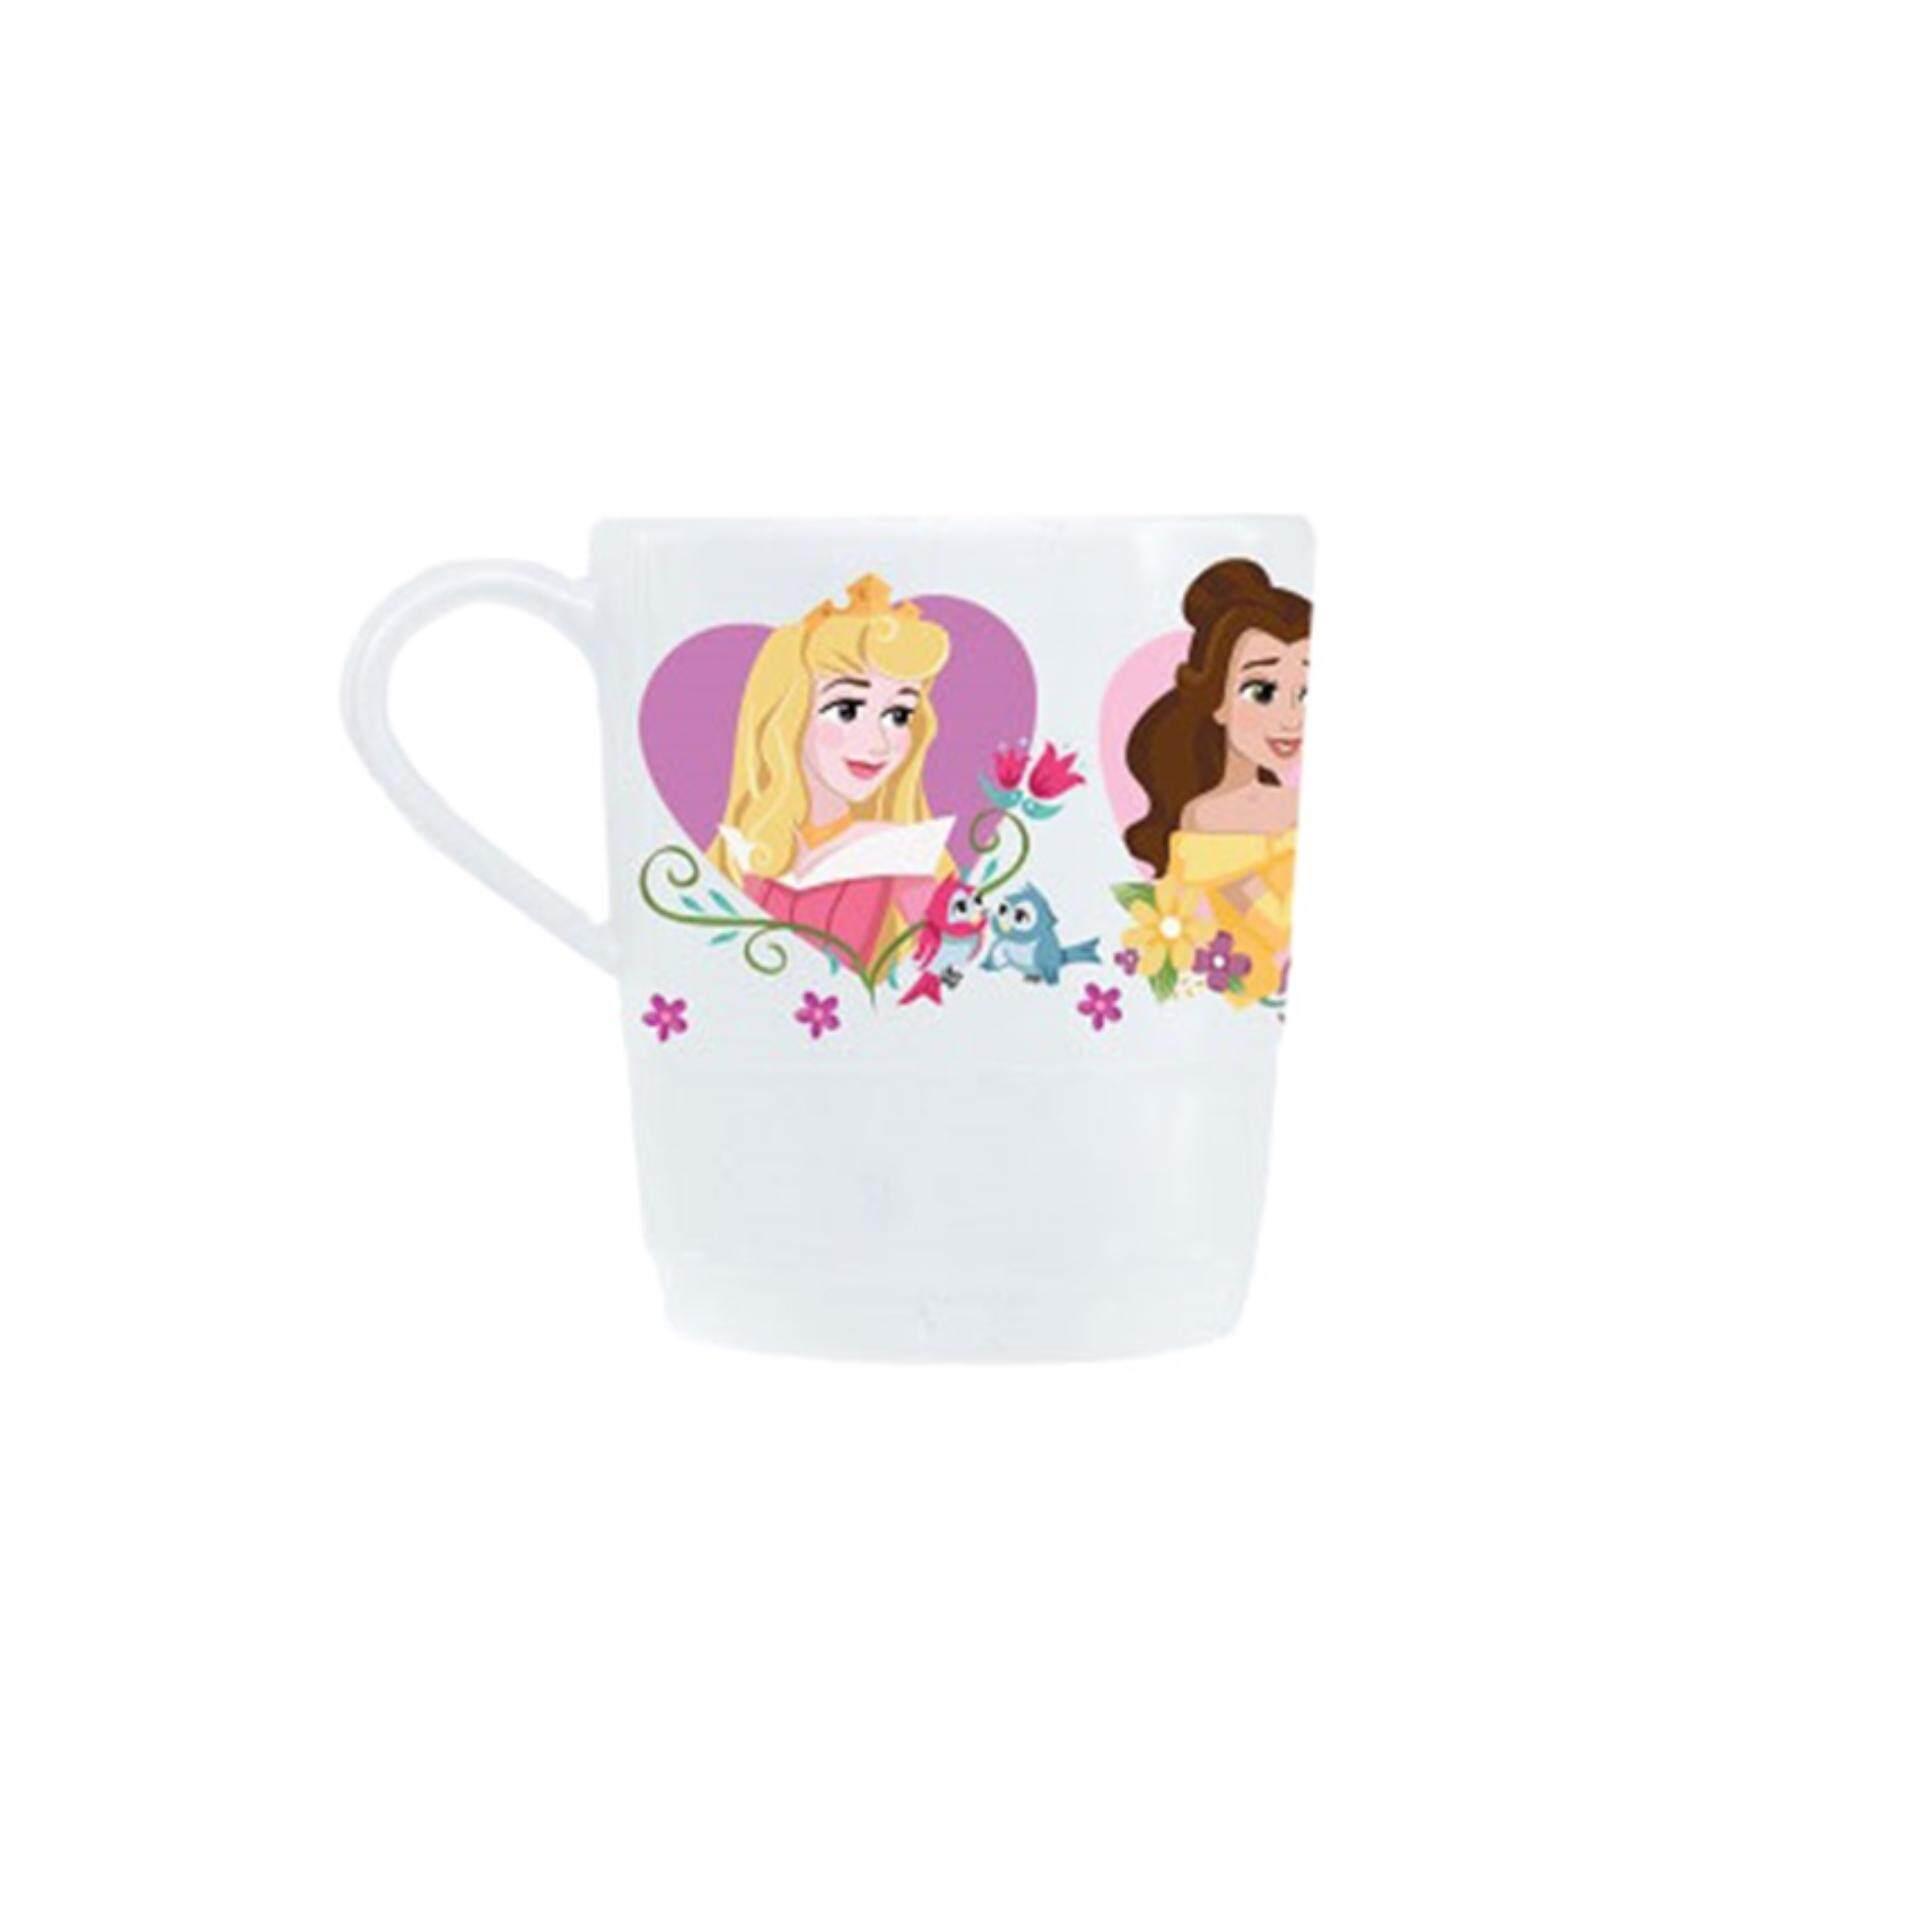 Disney Princess 3 Inches Melamine Stacking Mug - Multicolour